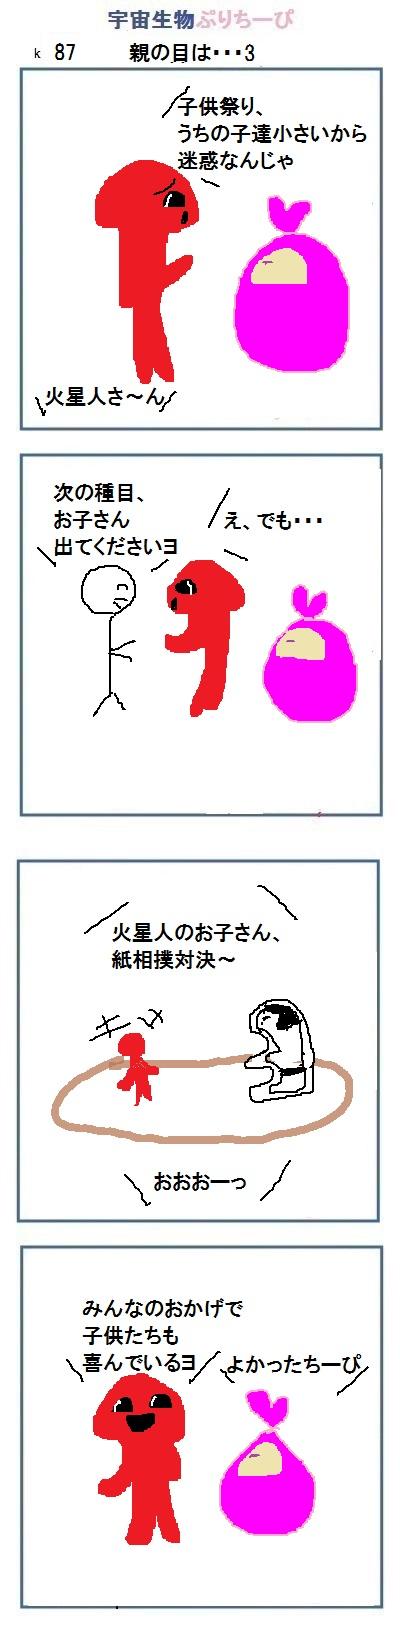 160831_k87.jpg